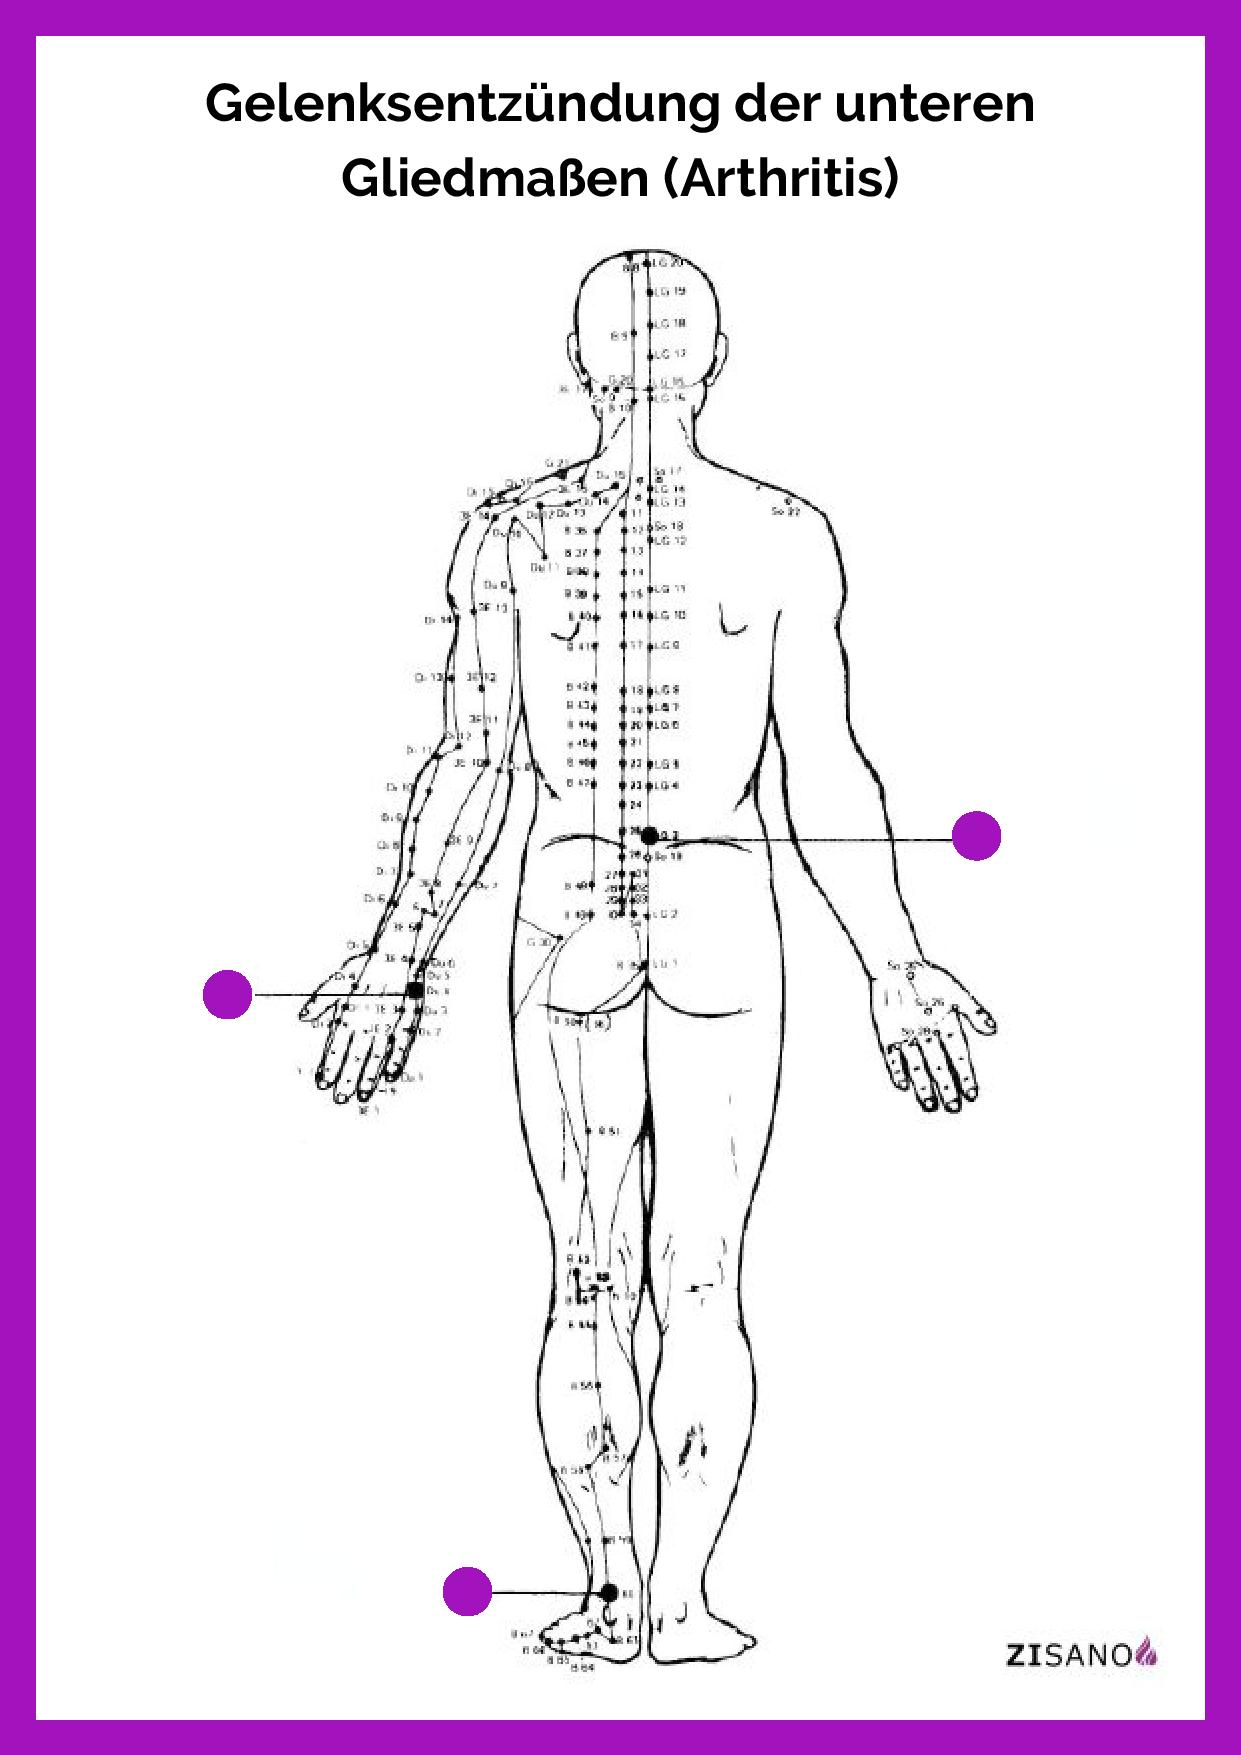 Meridiane - Gelenksentzündung der unteren Gliedmaßen (Arthritis)- Behandlung